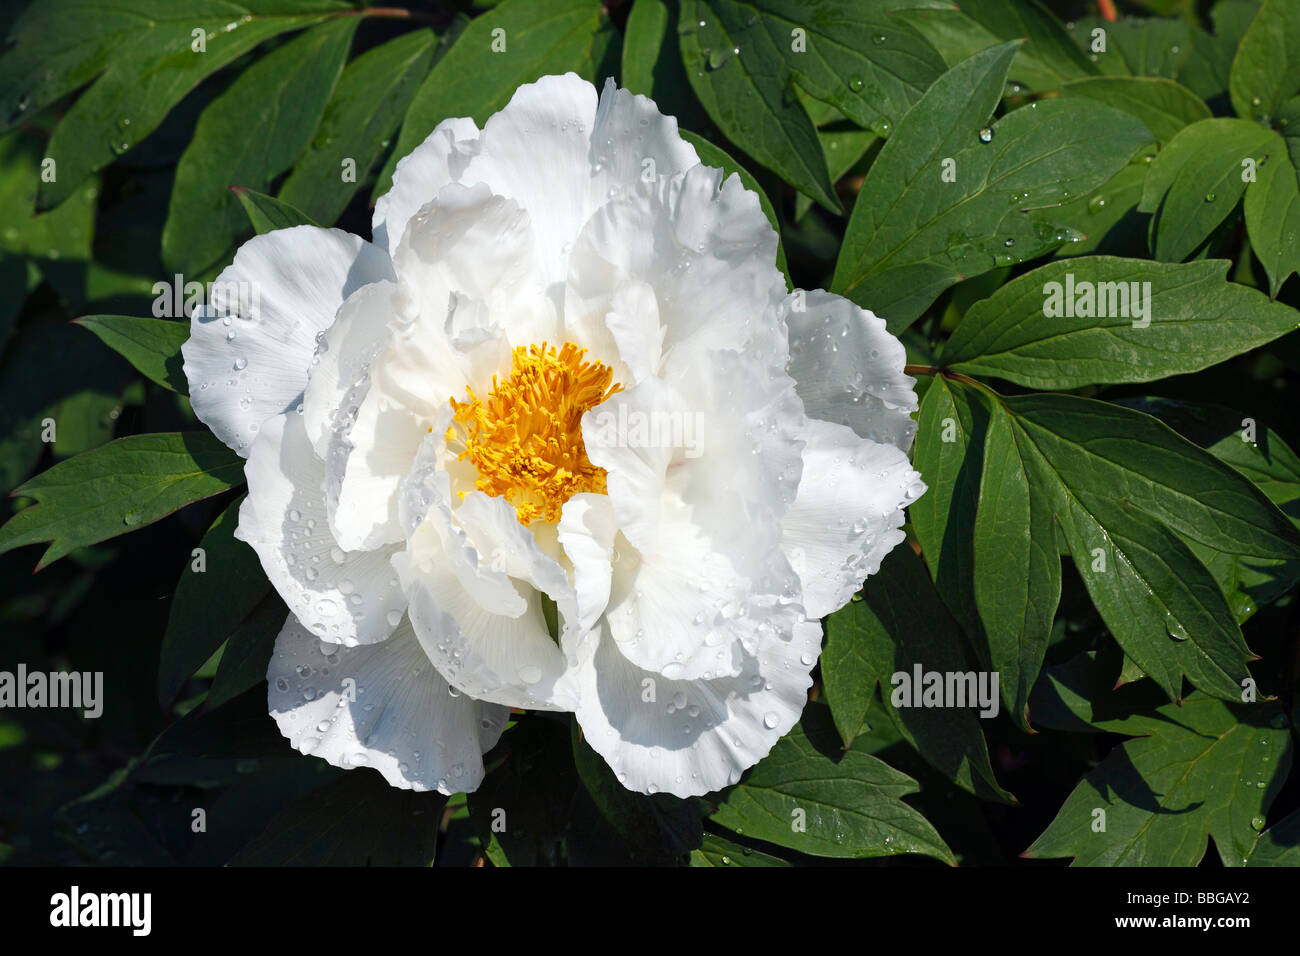 Flowering peony cultivar Hakubanryu, paeony hybrid (Paeonia suffruticosa hybrid Hakubanryu) Stock Photo